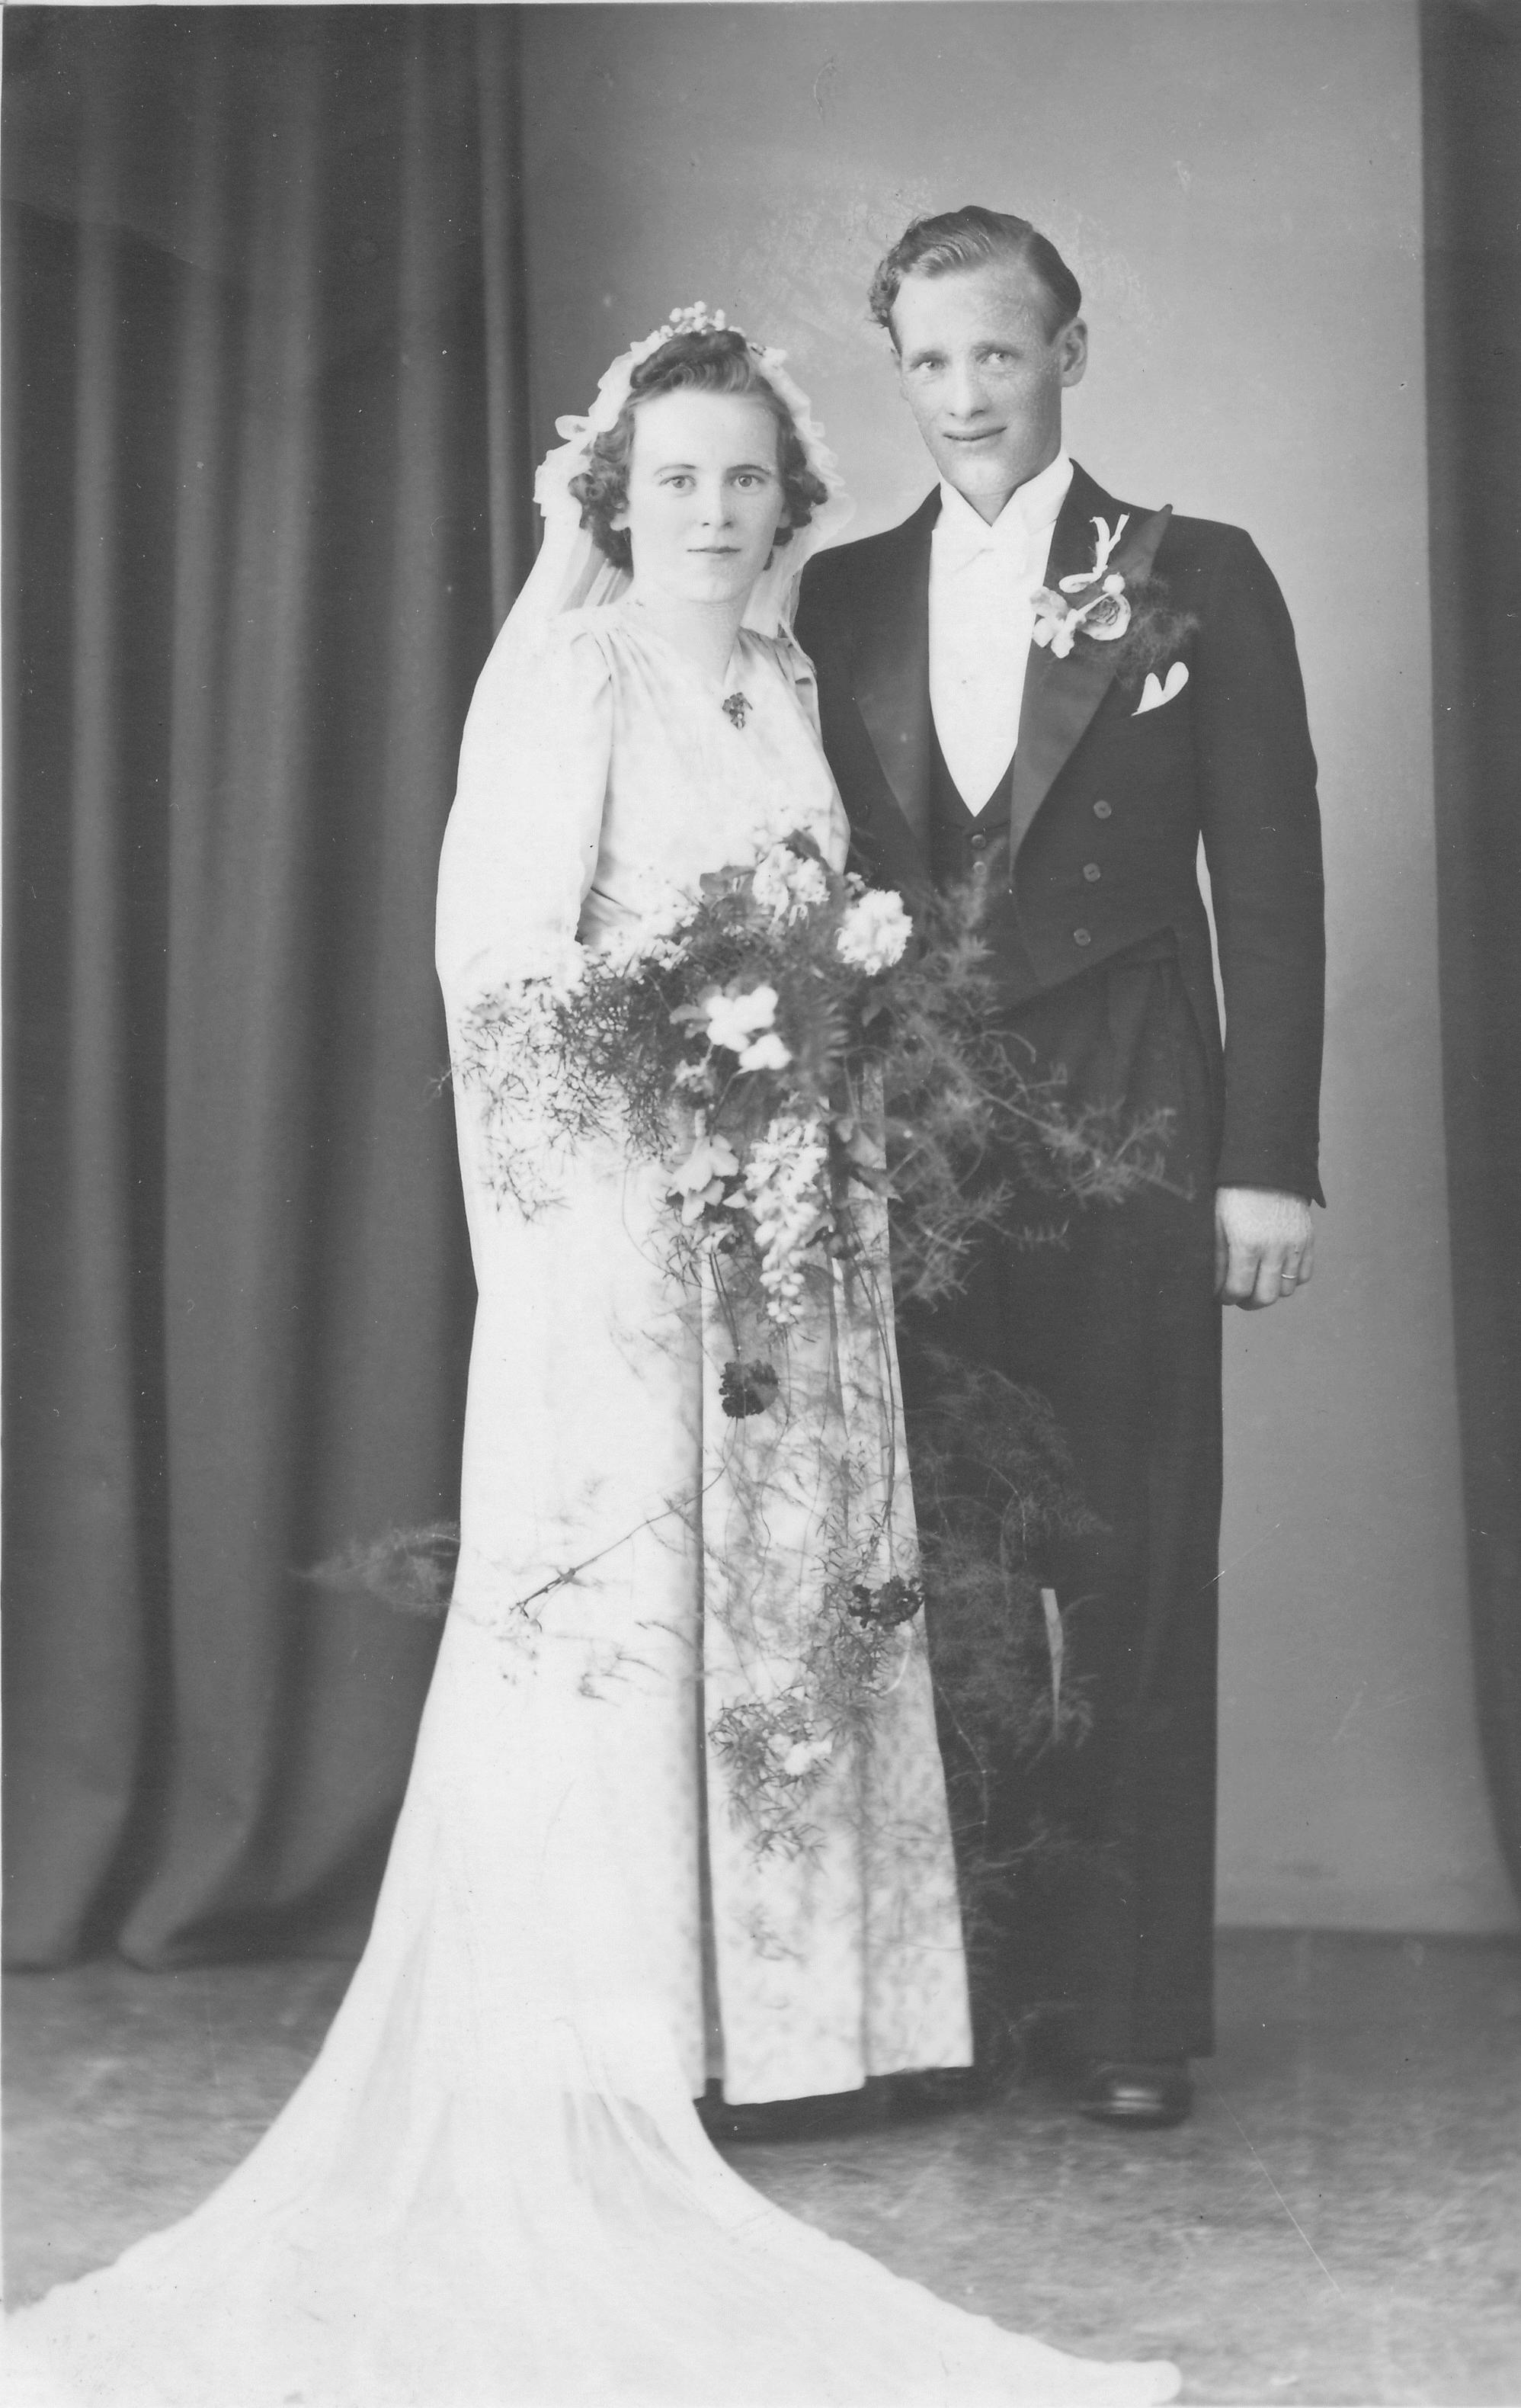 eva-norin-emil-spring-bröllop-juni-1943